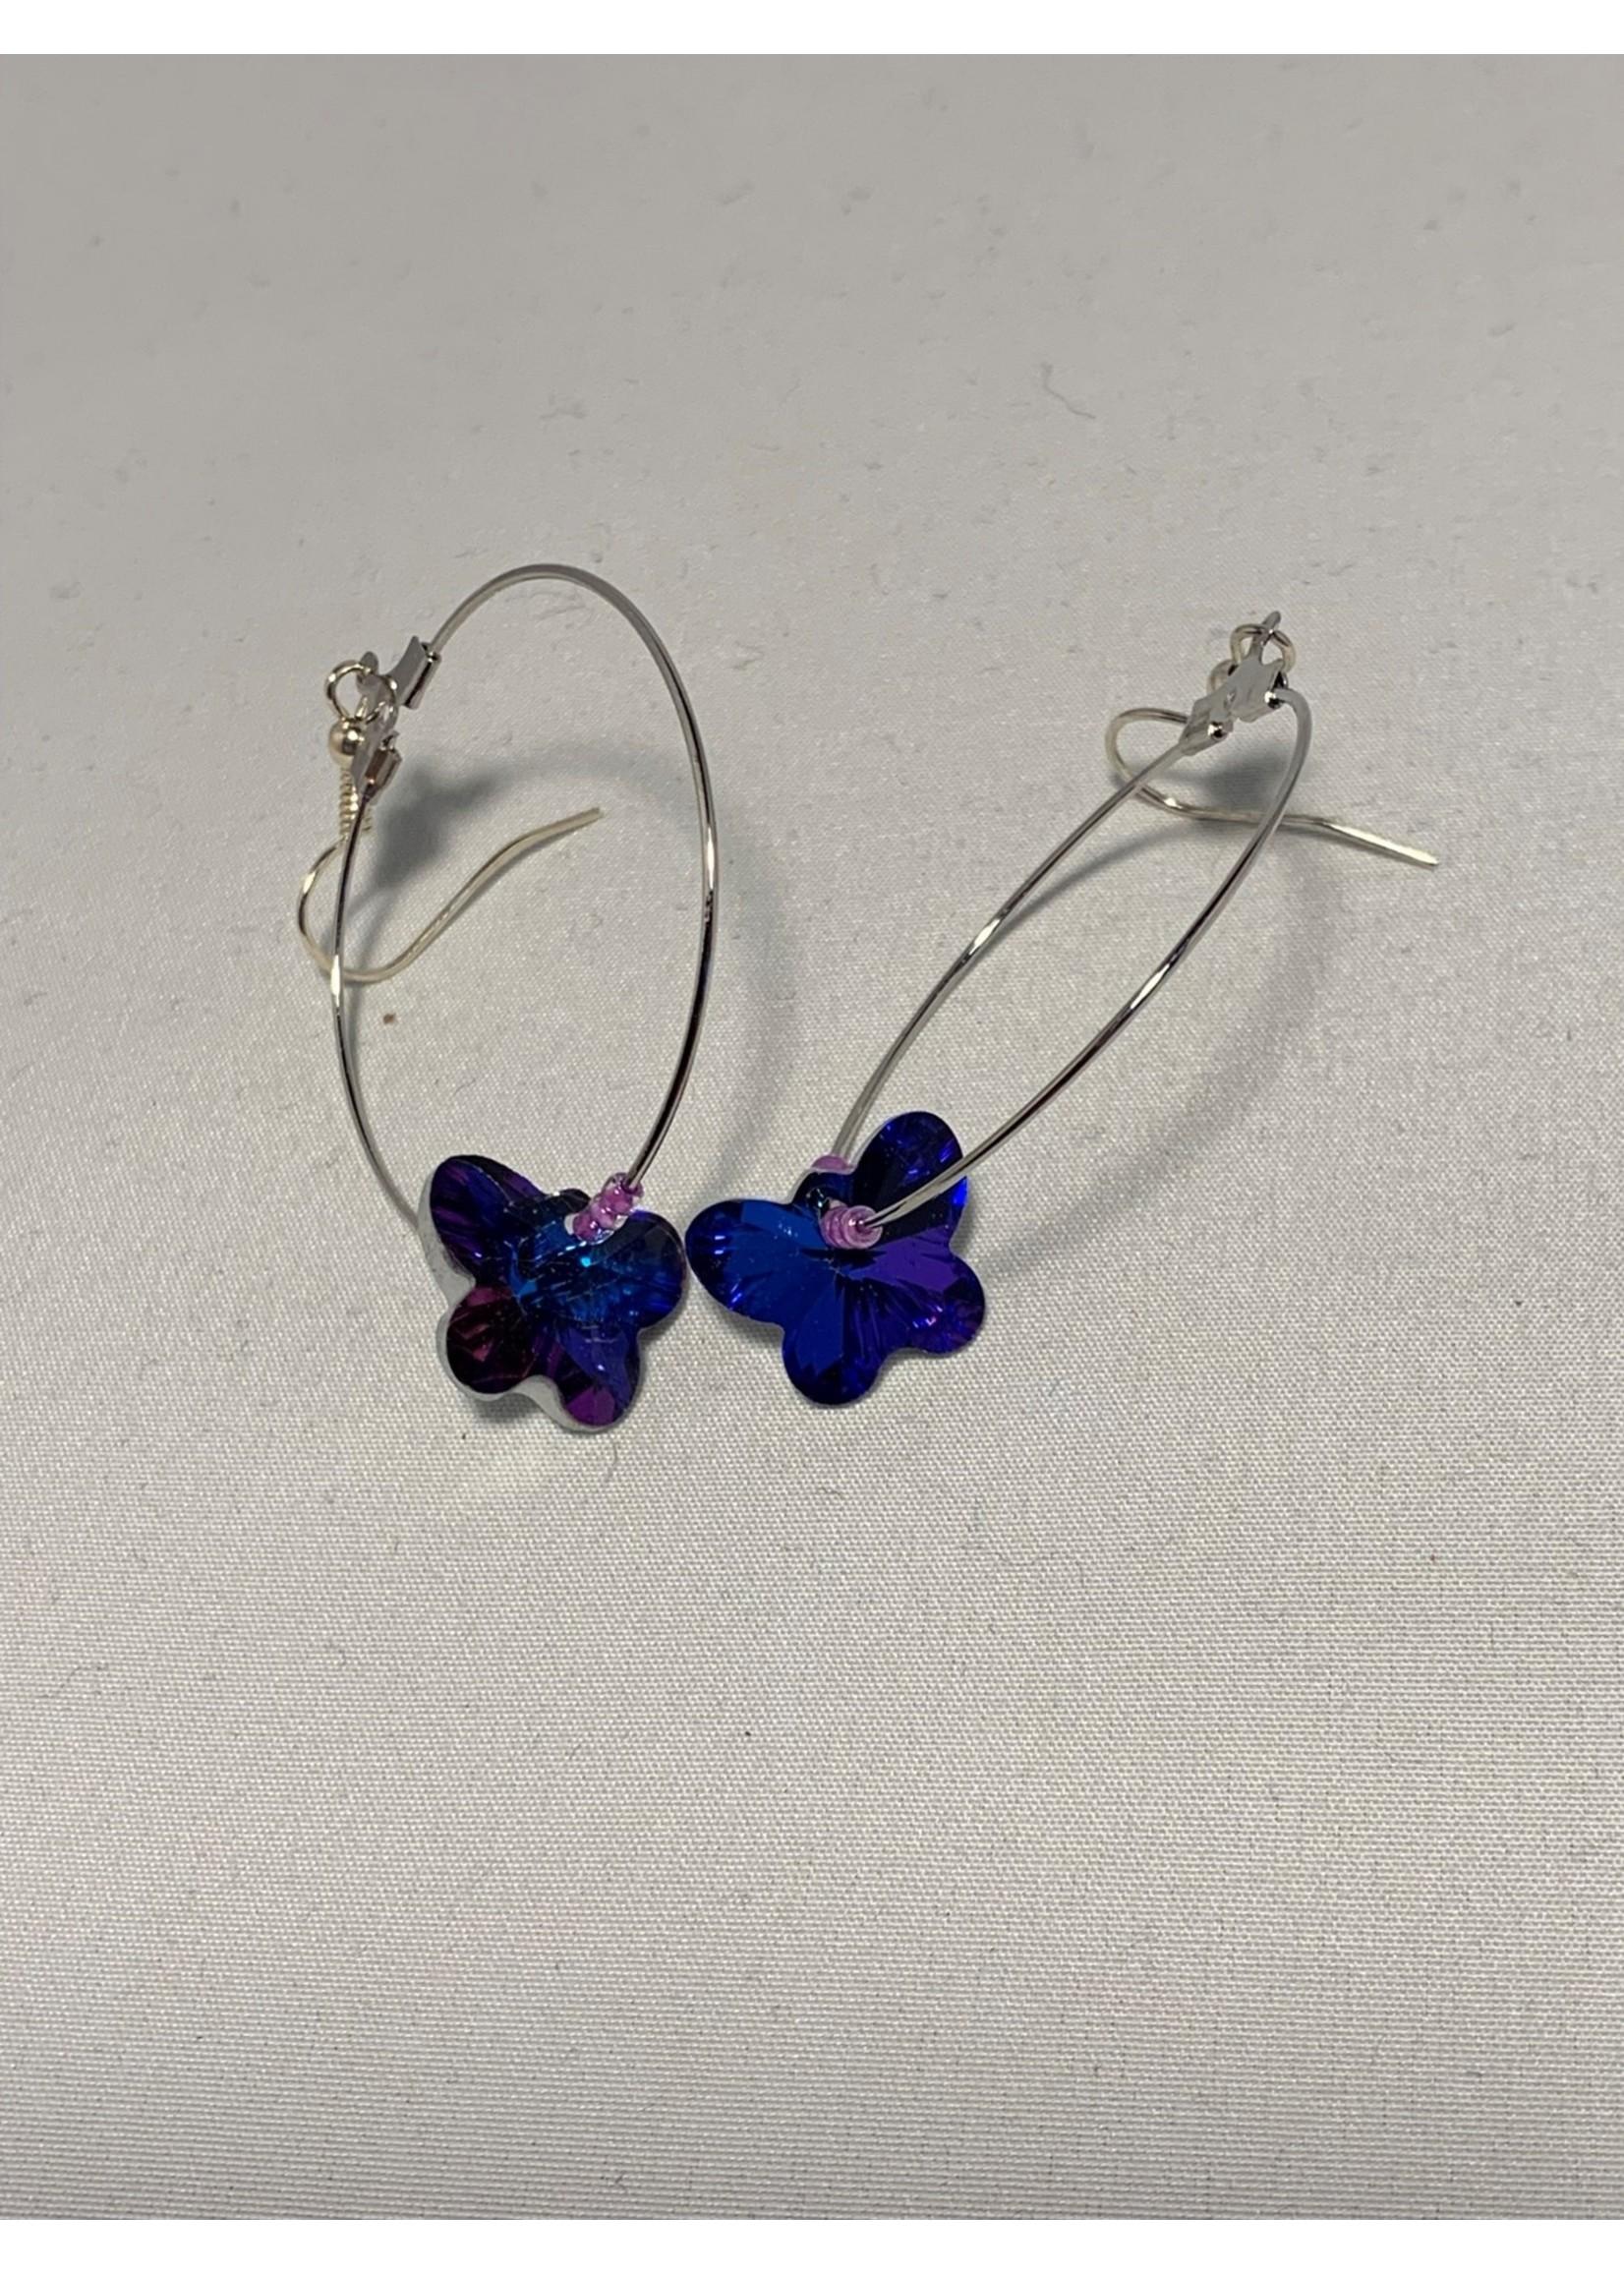 Silver Hoops with Blue & Purple Crystal Butterflies, Purple Beads